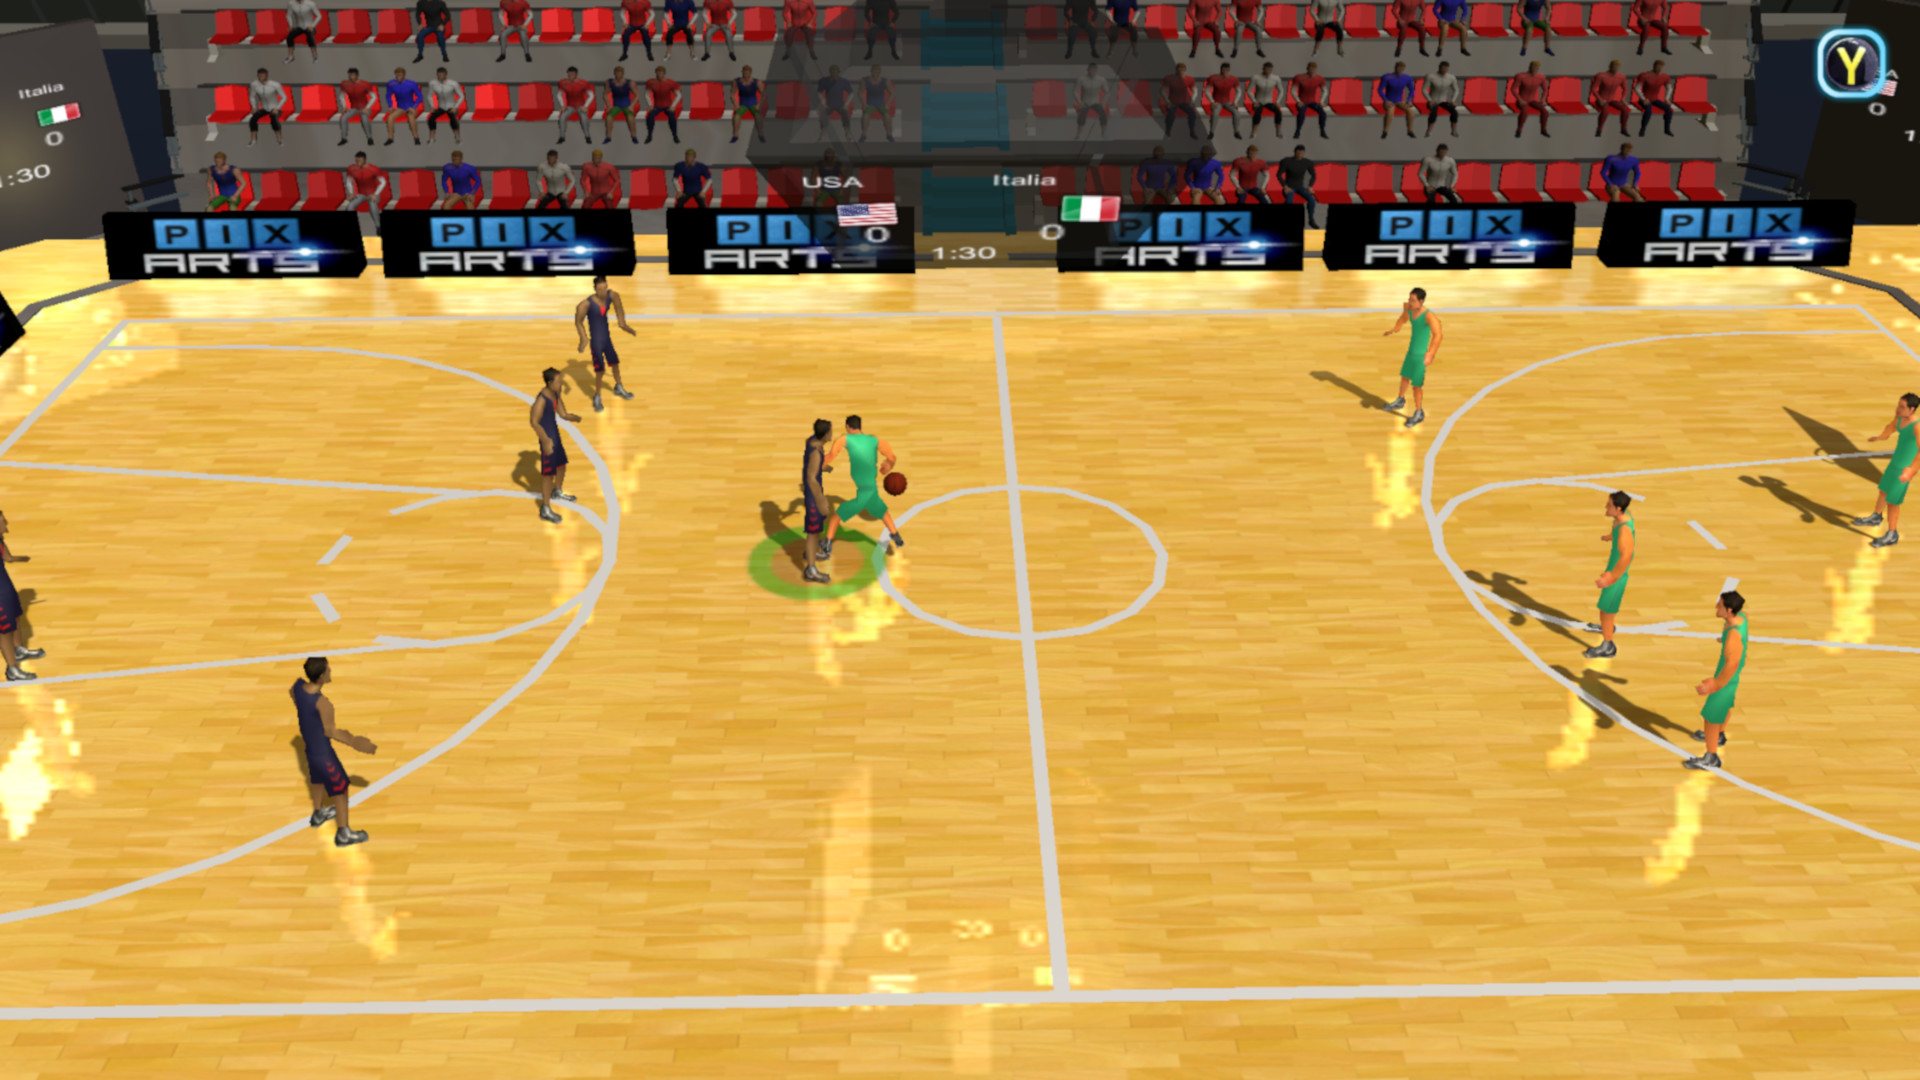 Olympic Basketball screenshot